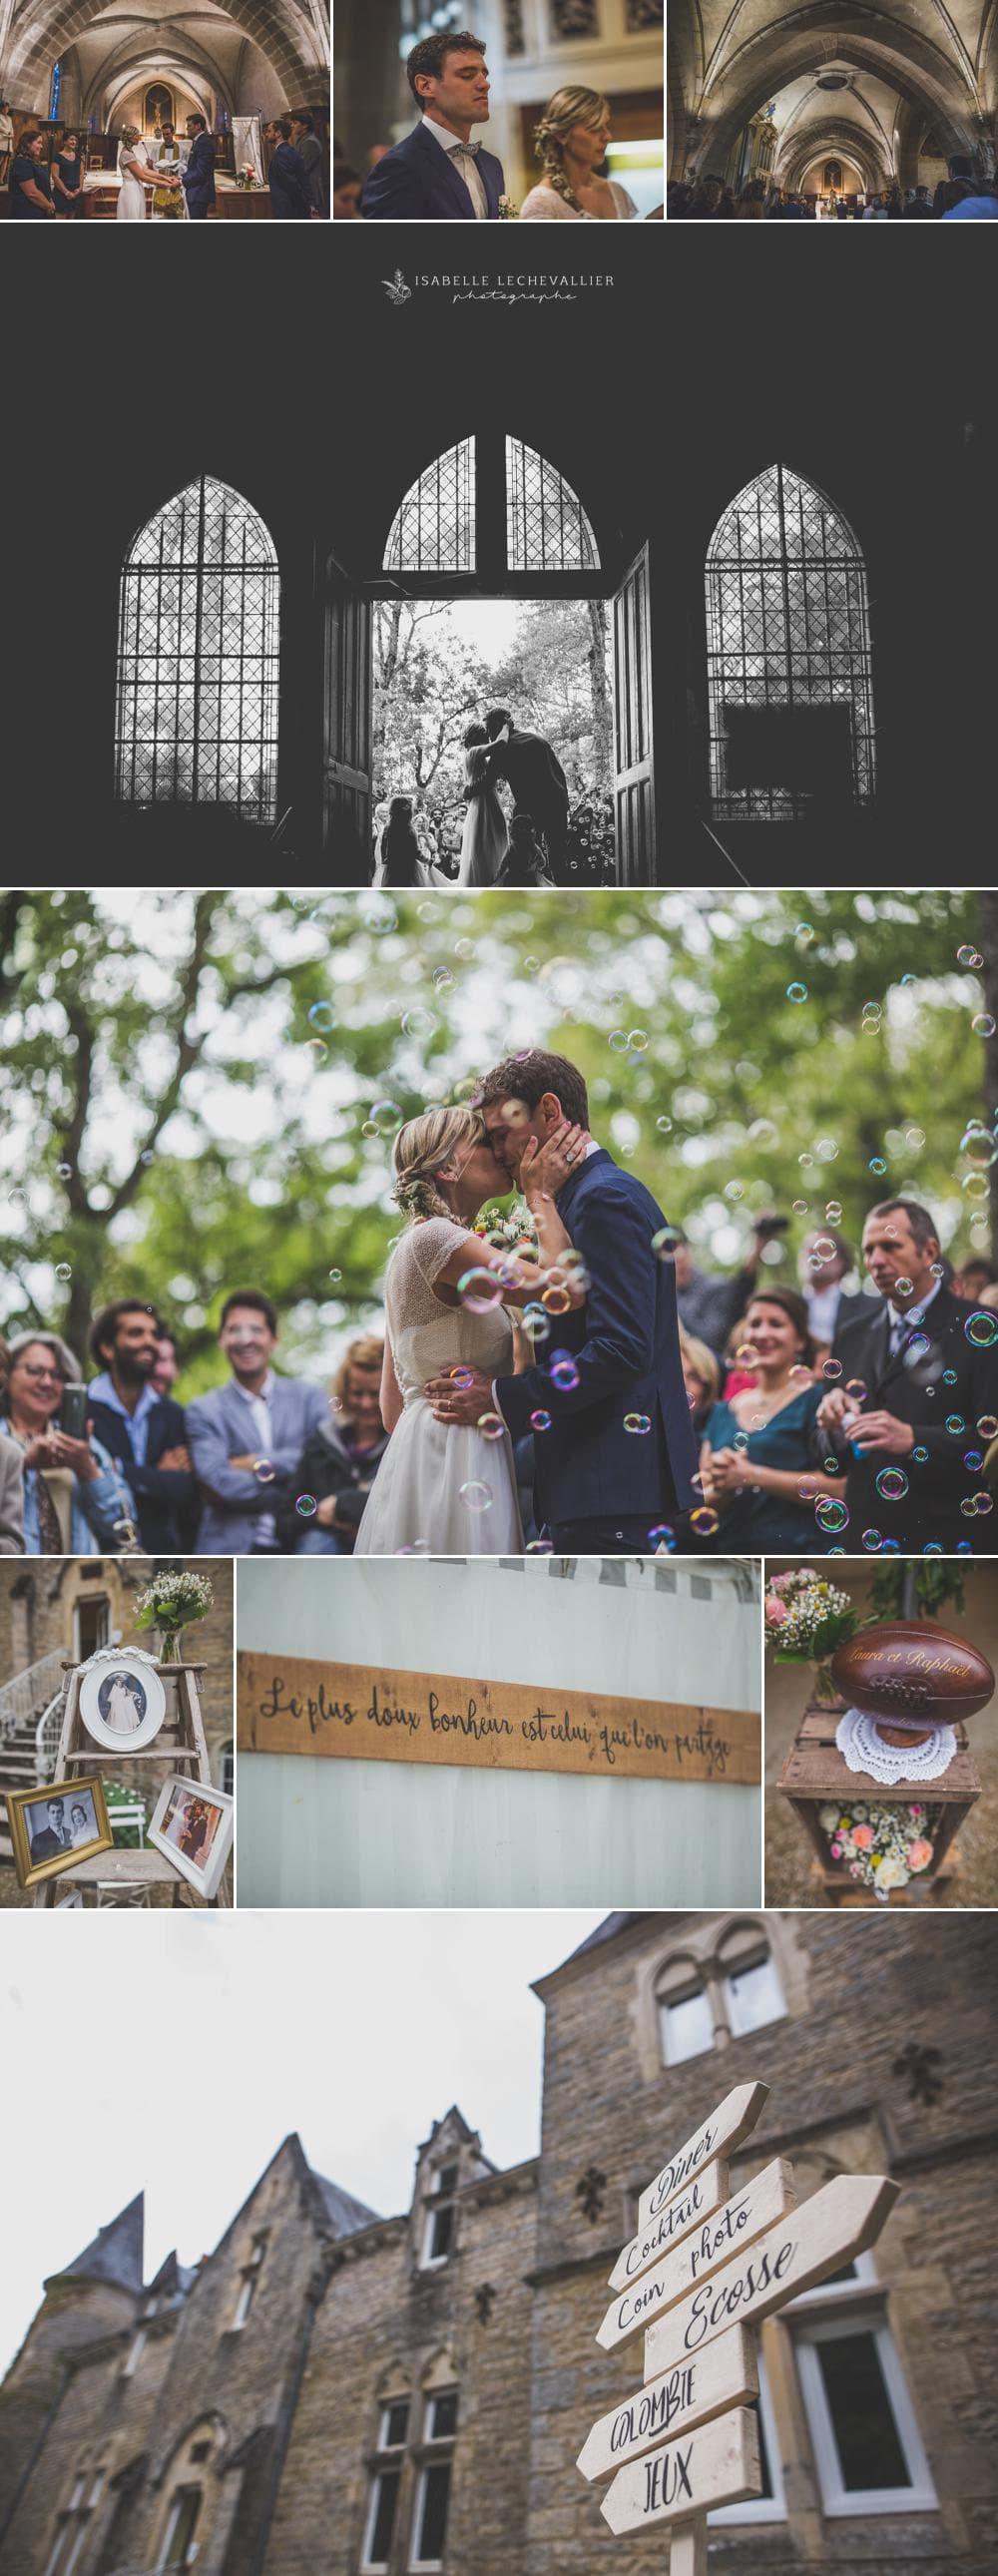 3 raisons de se marier en Bourgogne